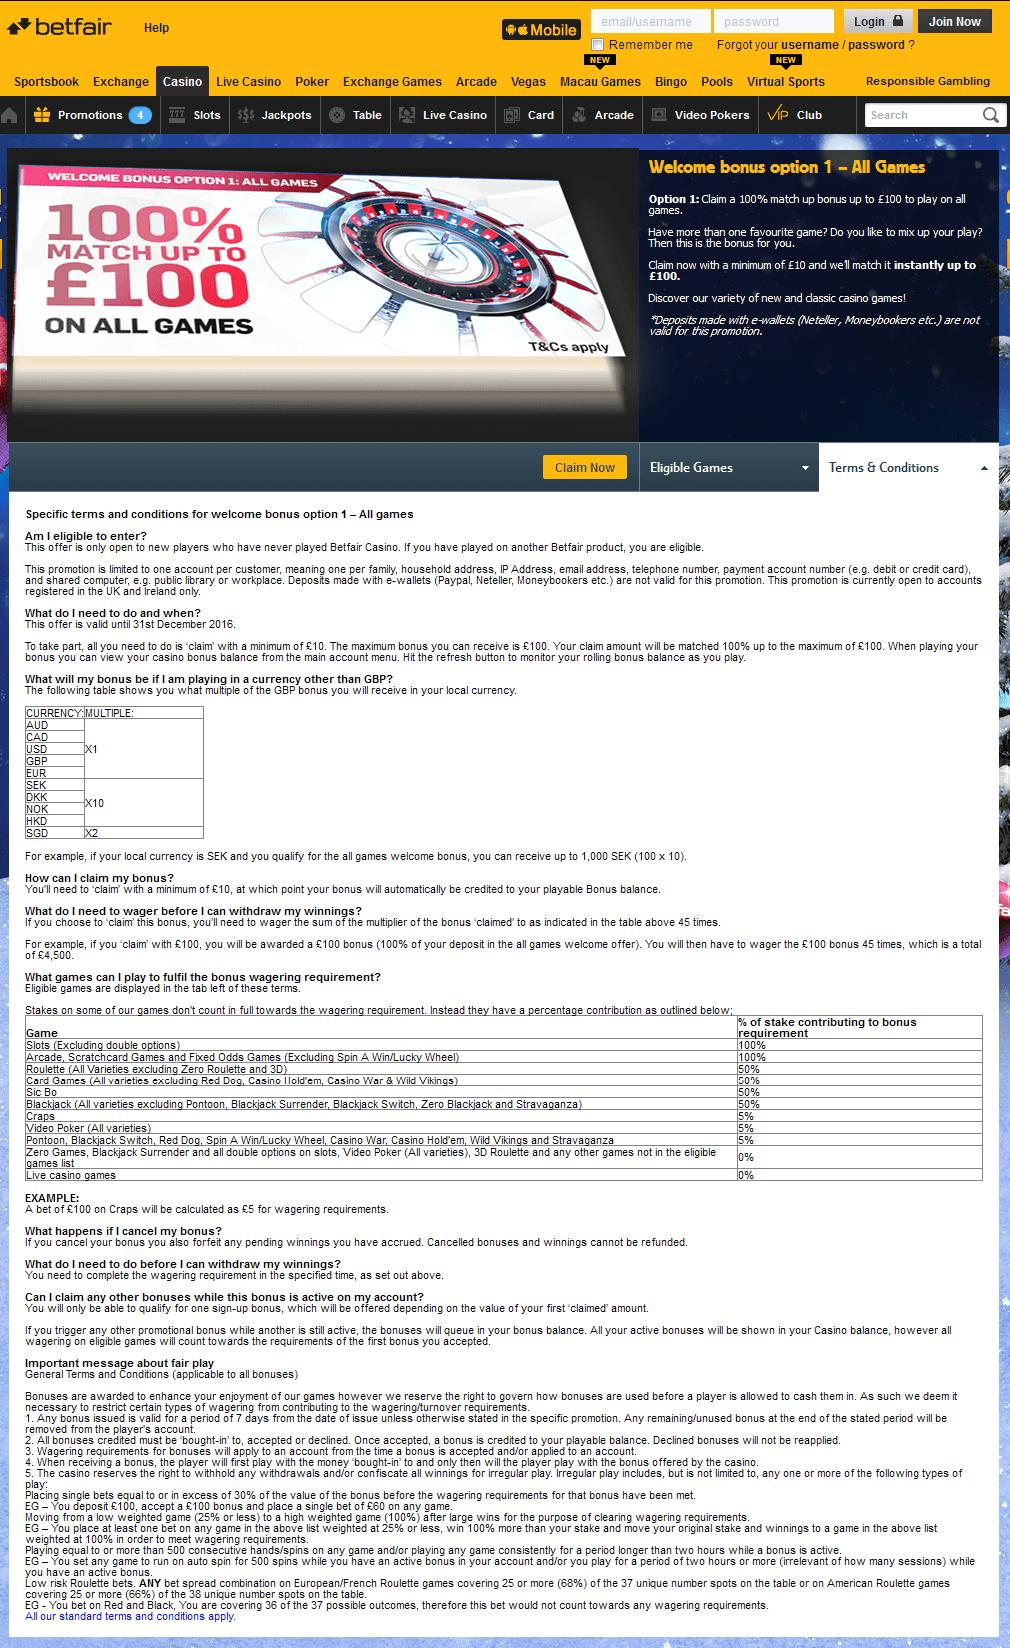 paypal deposit limit